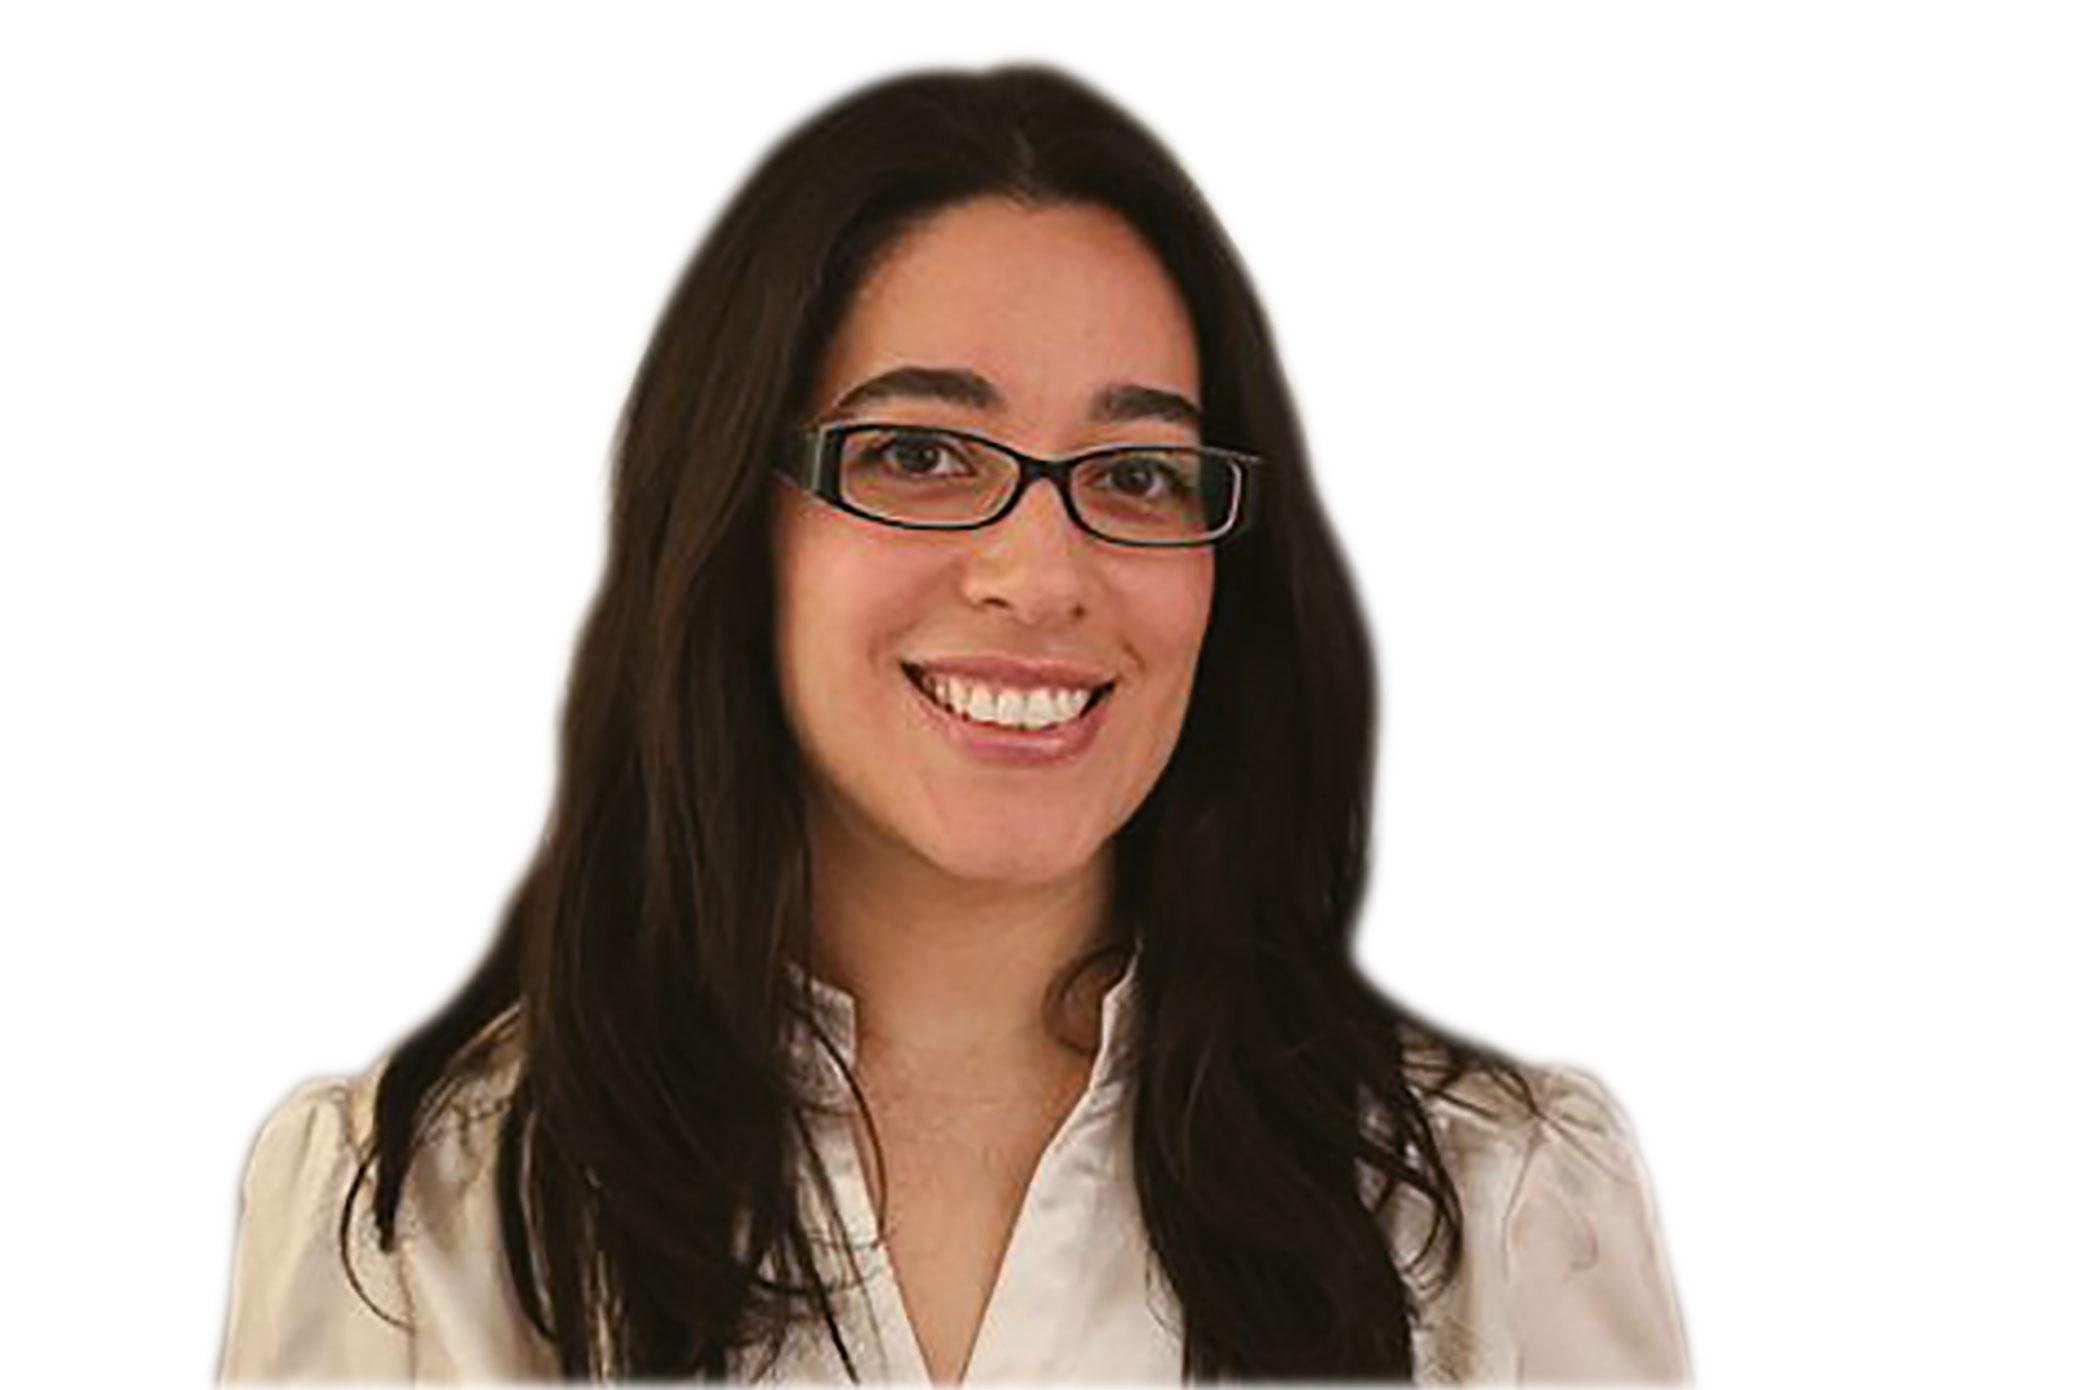 Melissa-Rodriguez-6866